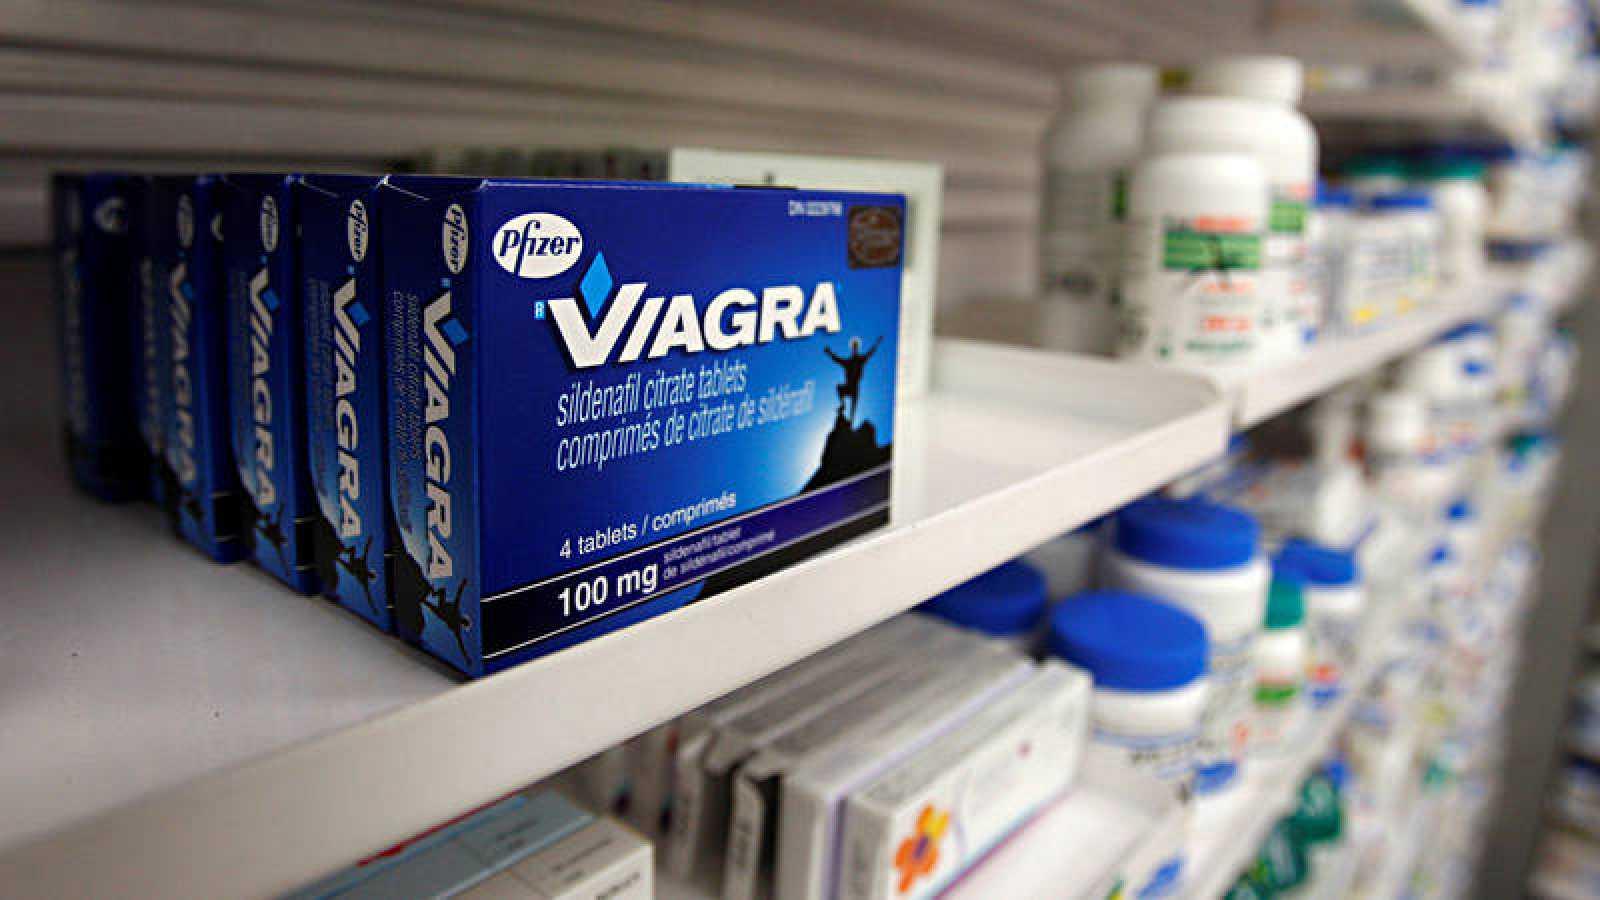 primer medicamento para la disfunción eréctil